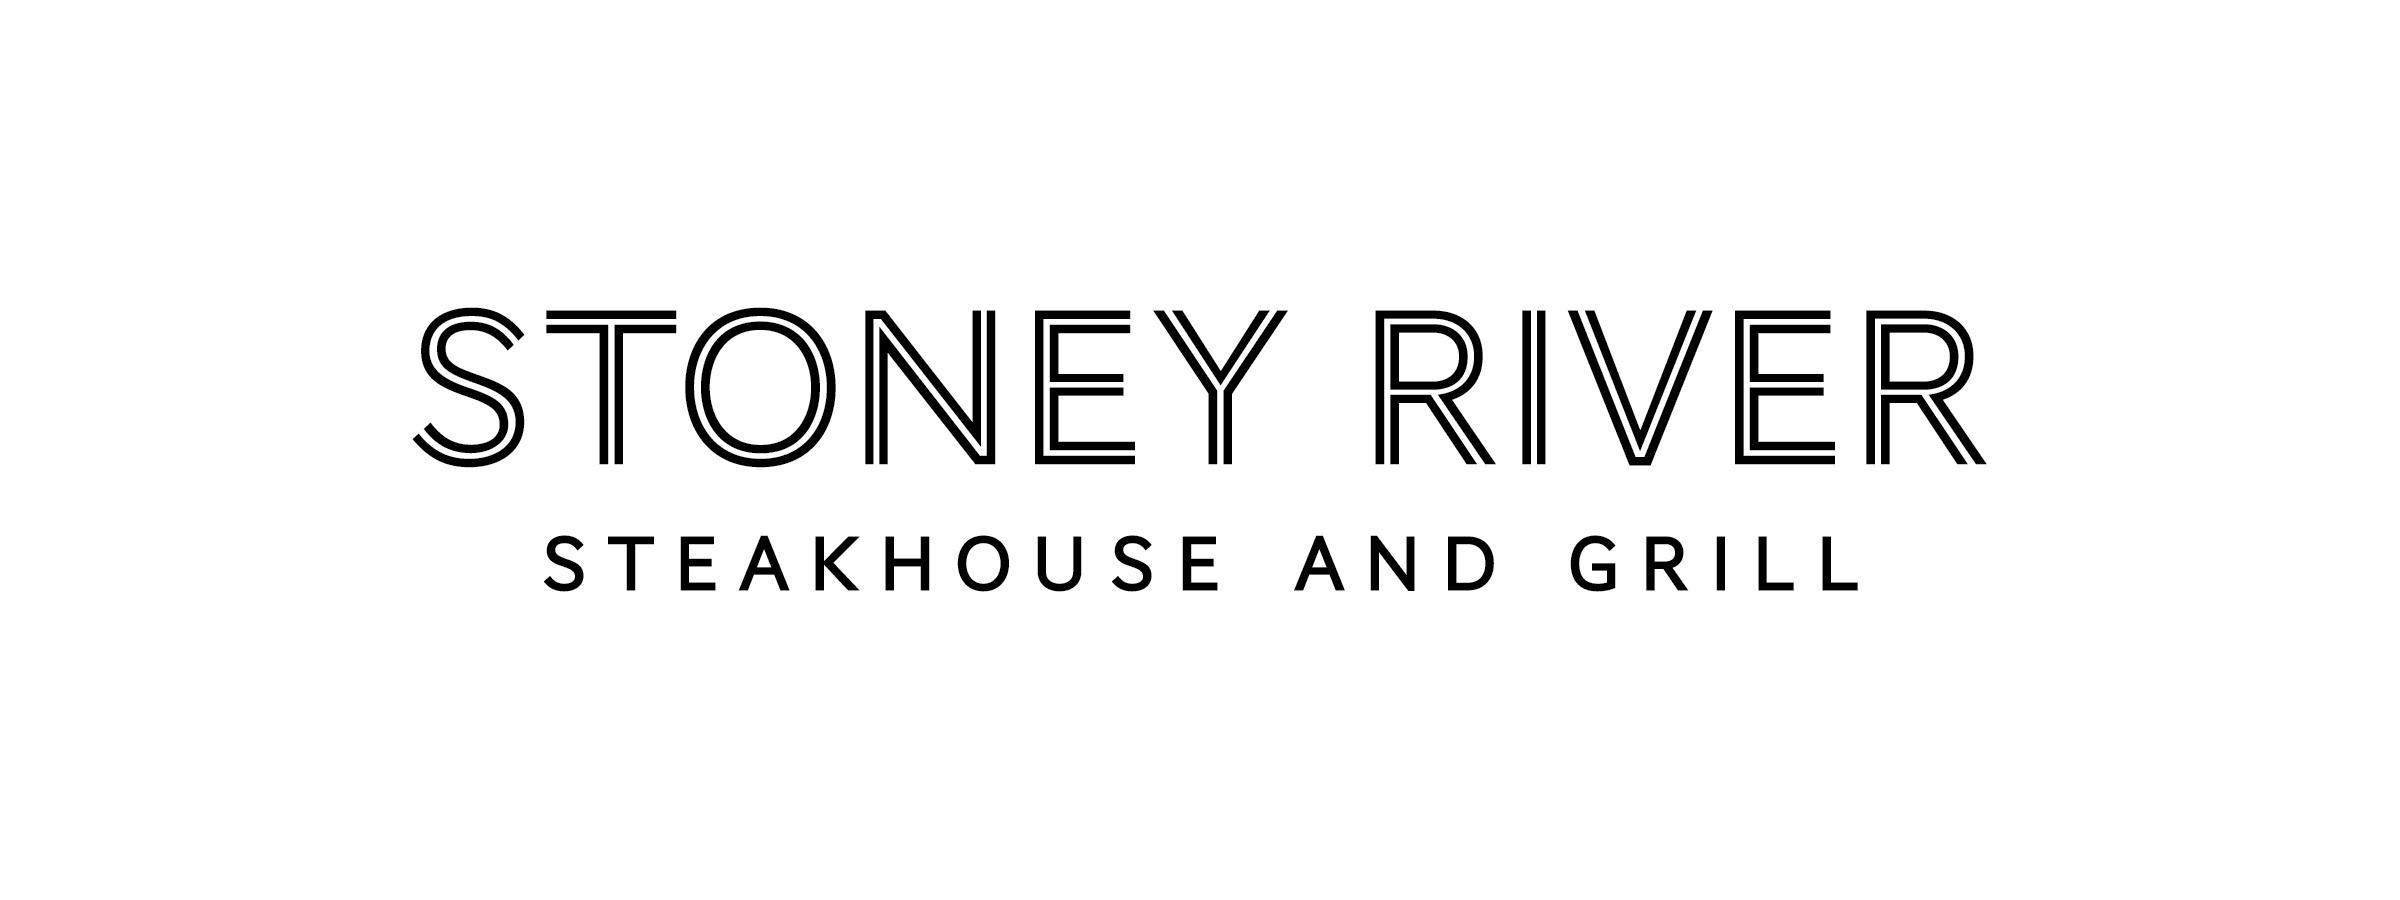 Photo at Stoney River Legendary Steaks